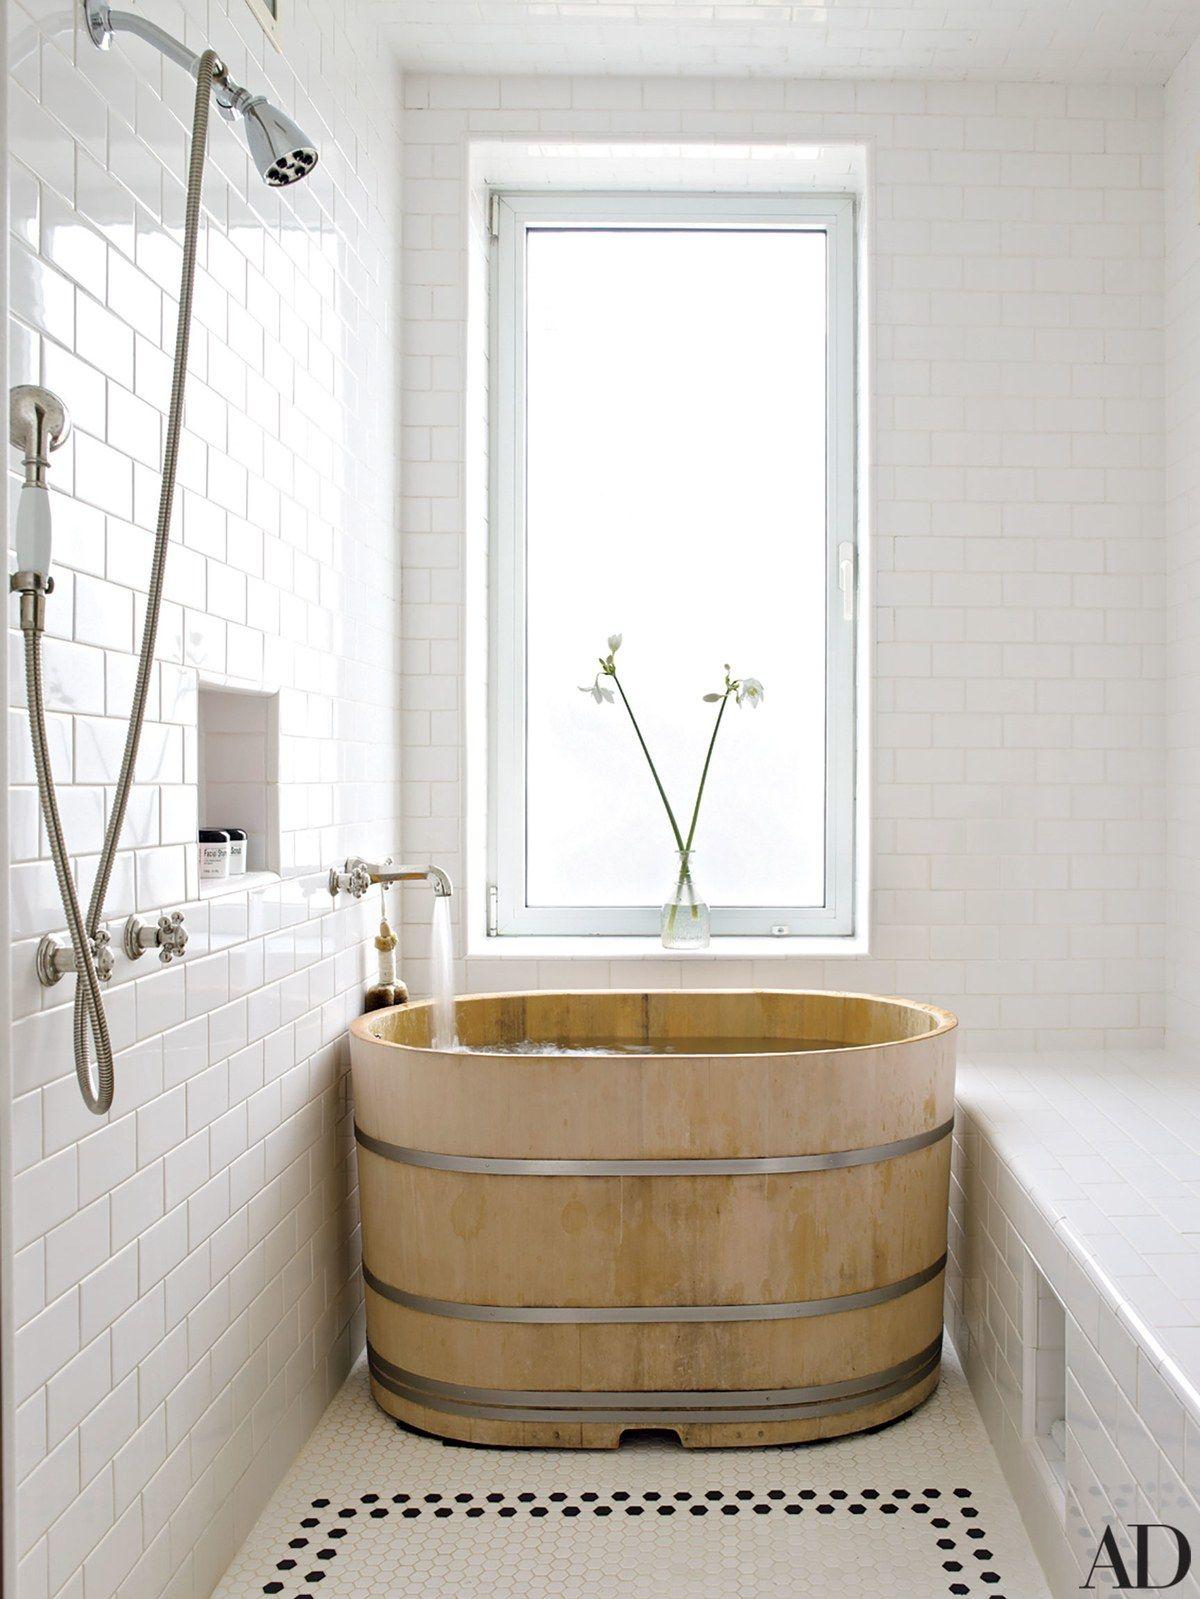 Ordinaire A Japanese Hinoki Wood Soaking Tub Anchors Midleru0027s Bath.